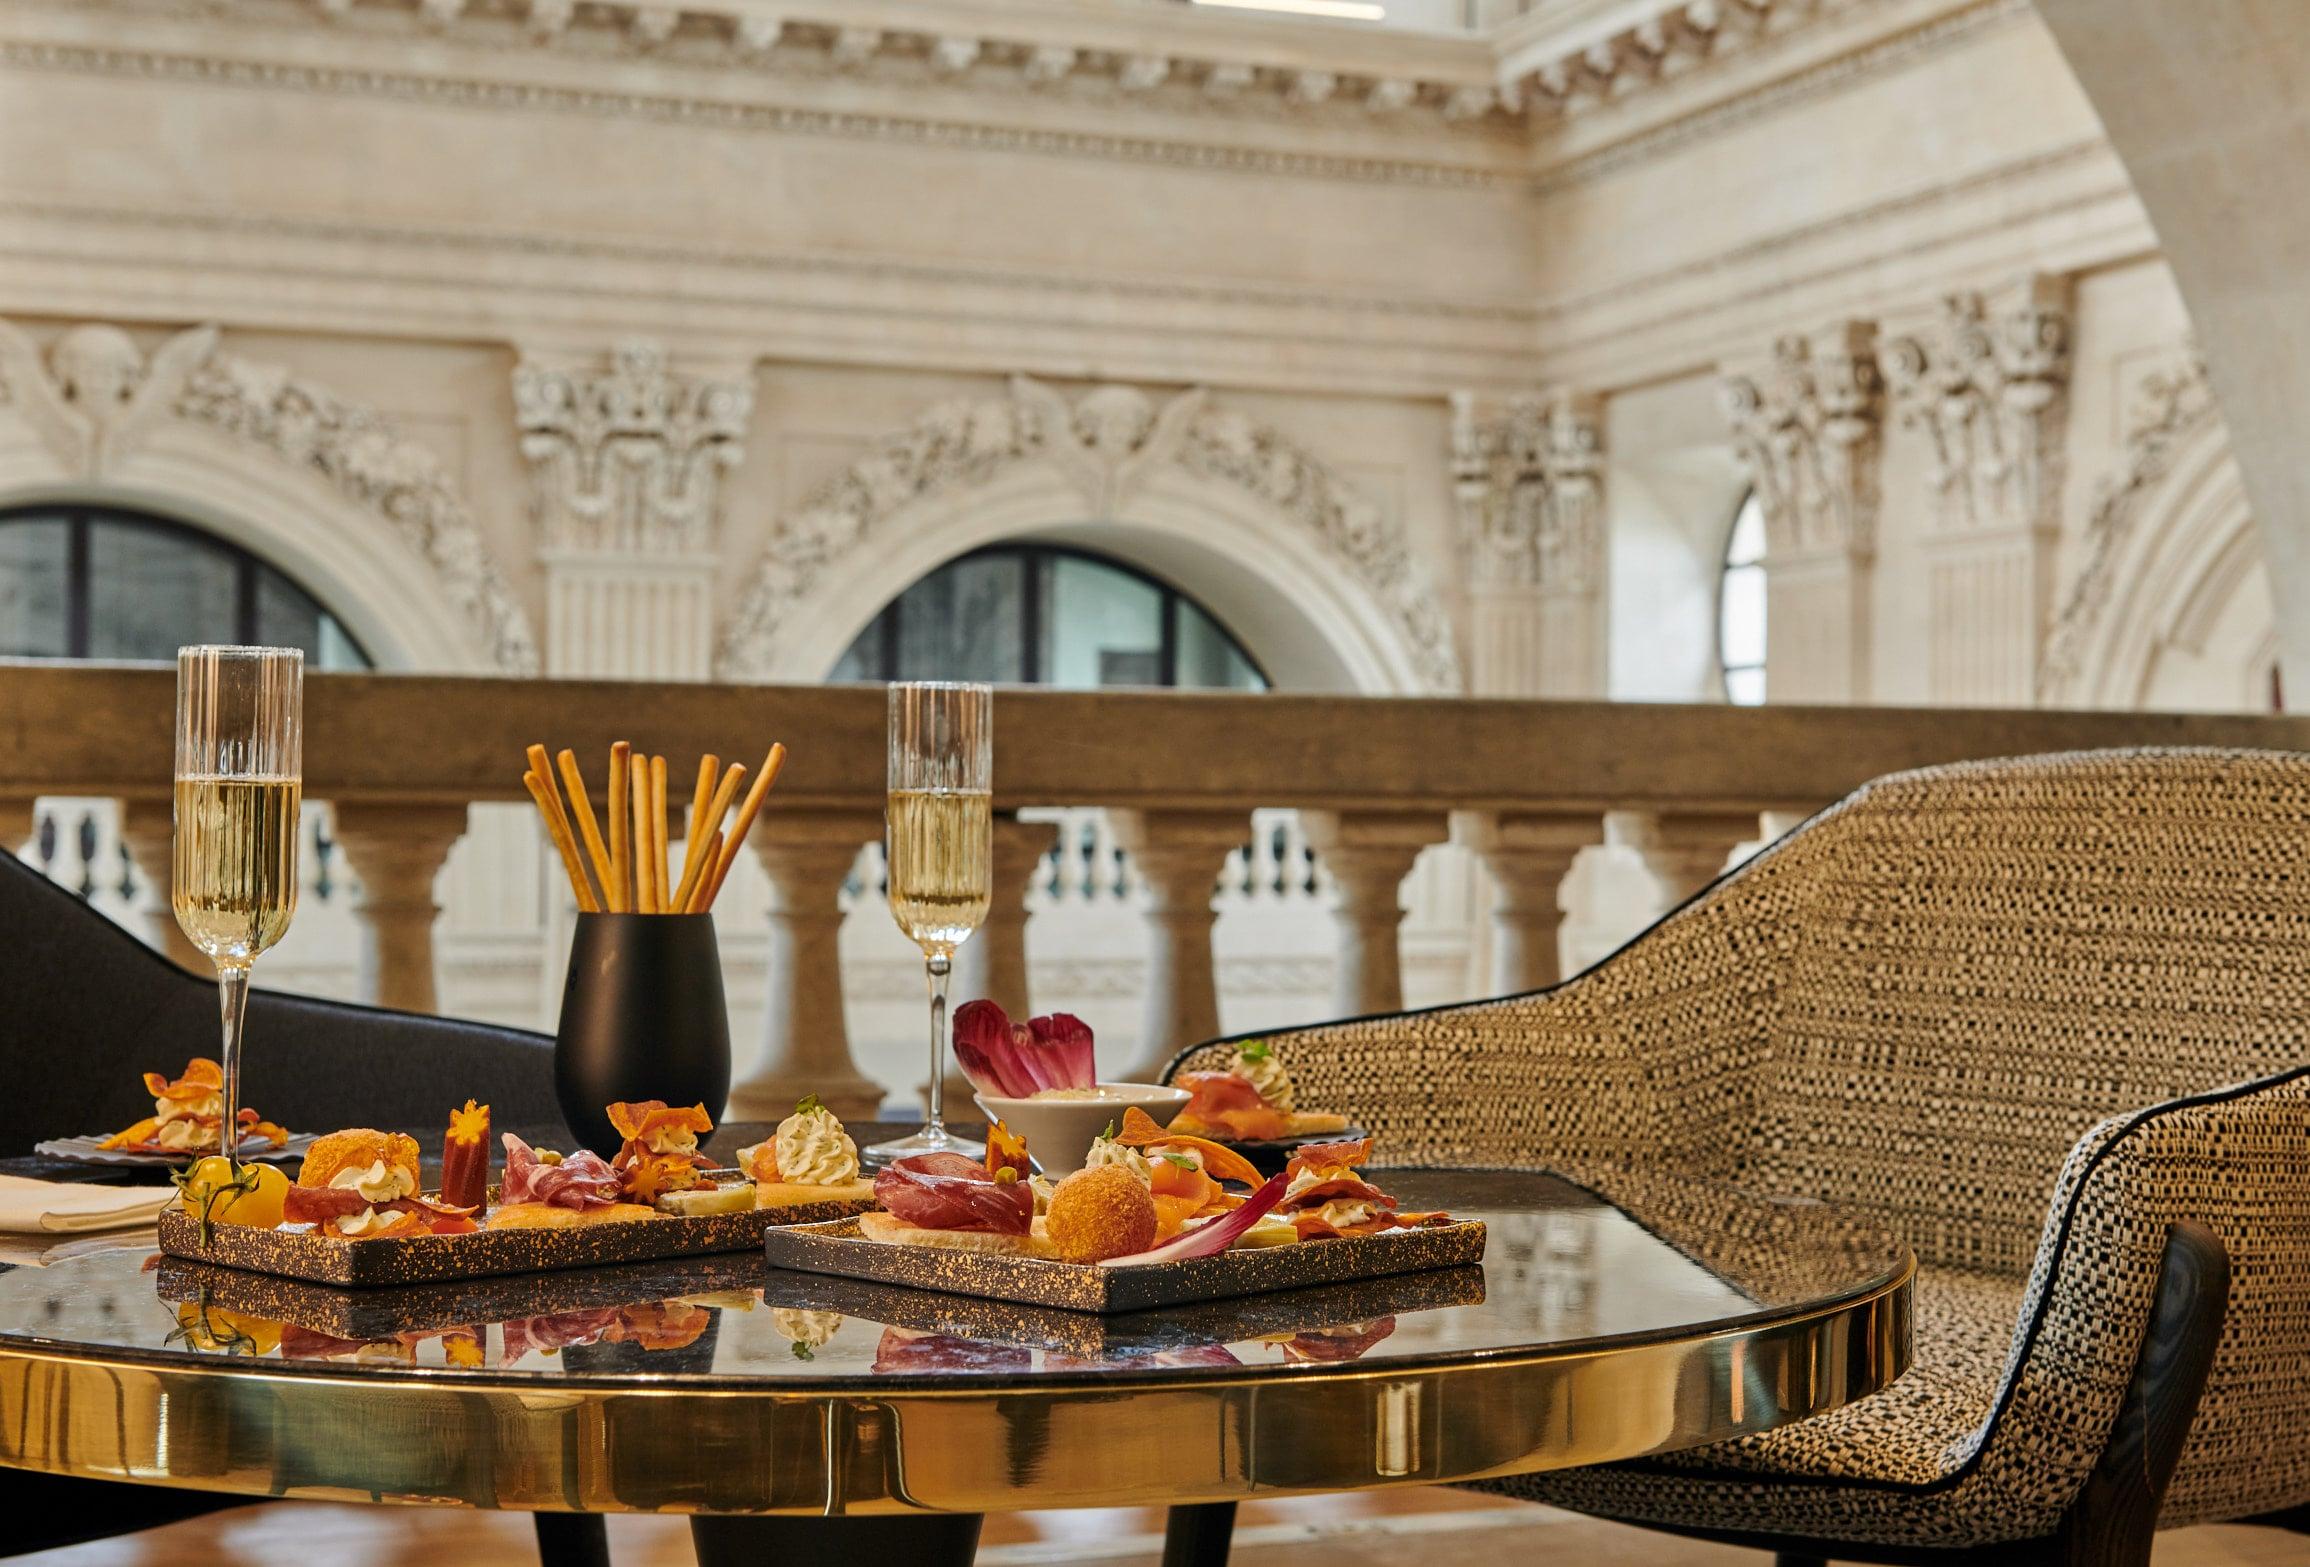 InterContinental Lyon - Hotel Dieu - club lounge - afterwork